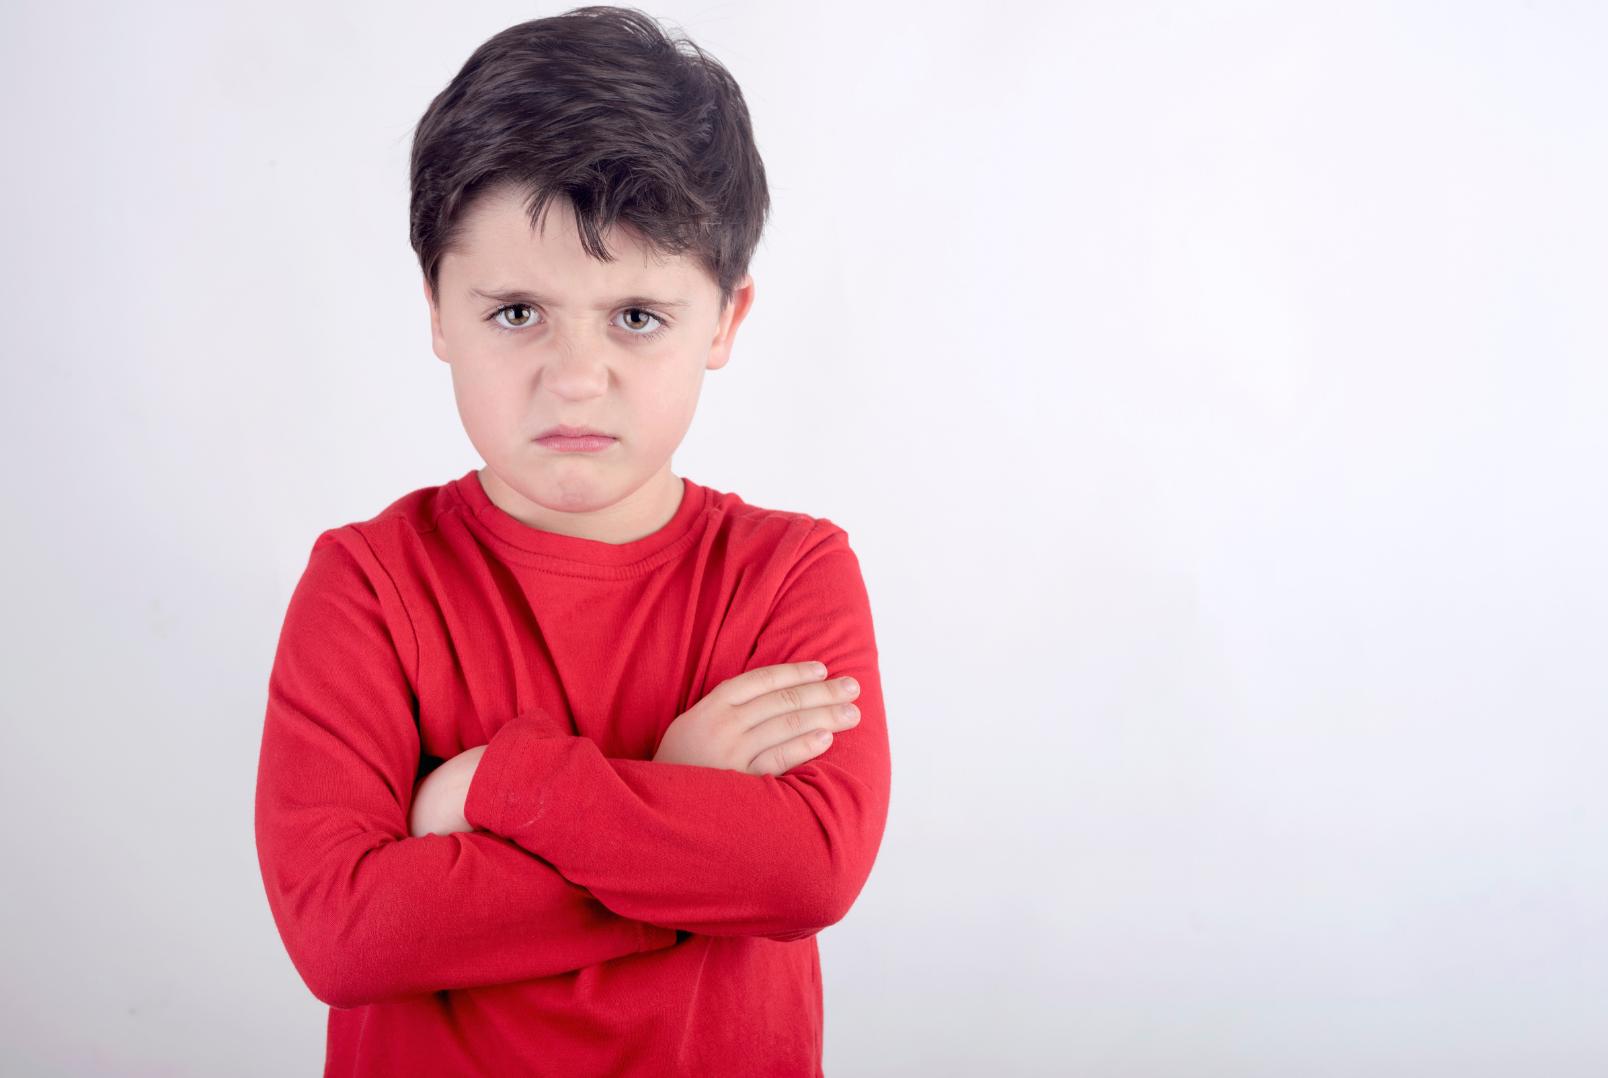 enfant fâché butrfly